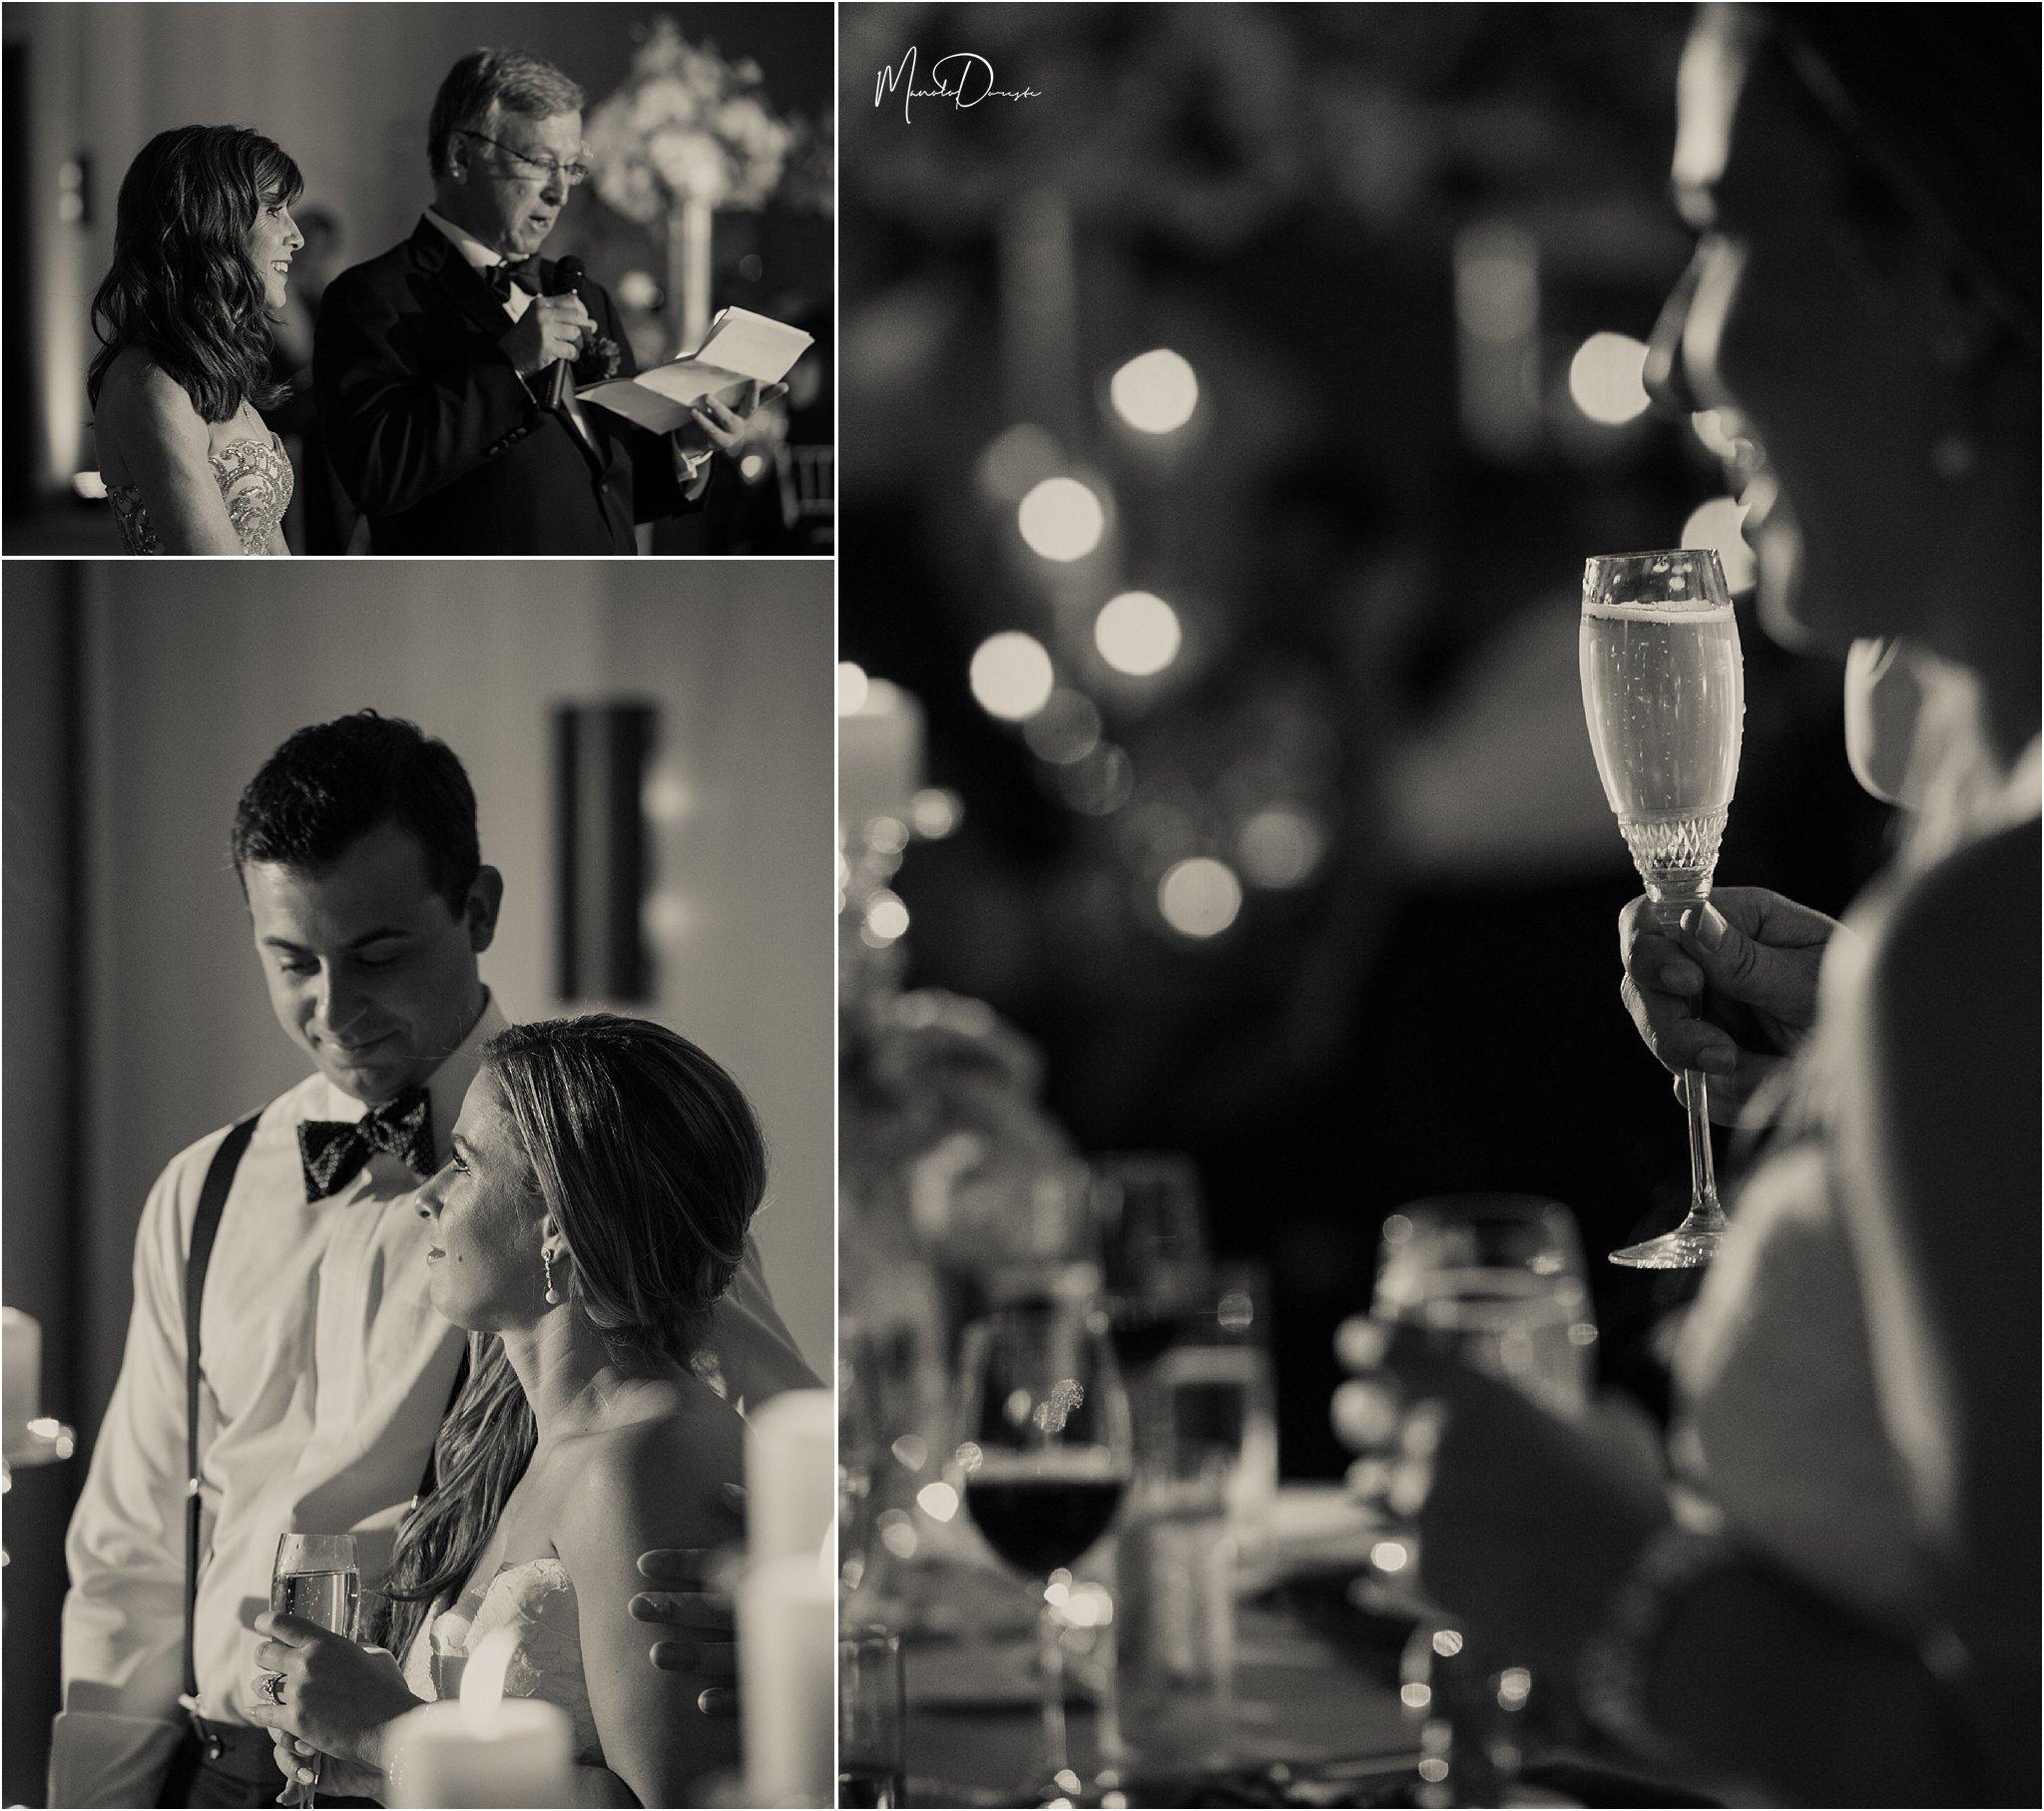 0678_ManoloDoreste_InFocusStudios_Wedding_Family_Photography_Miami_MiamiPhotographer.jpg